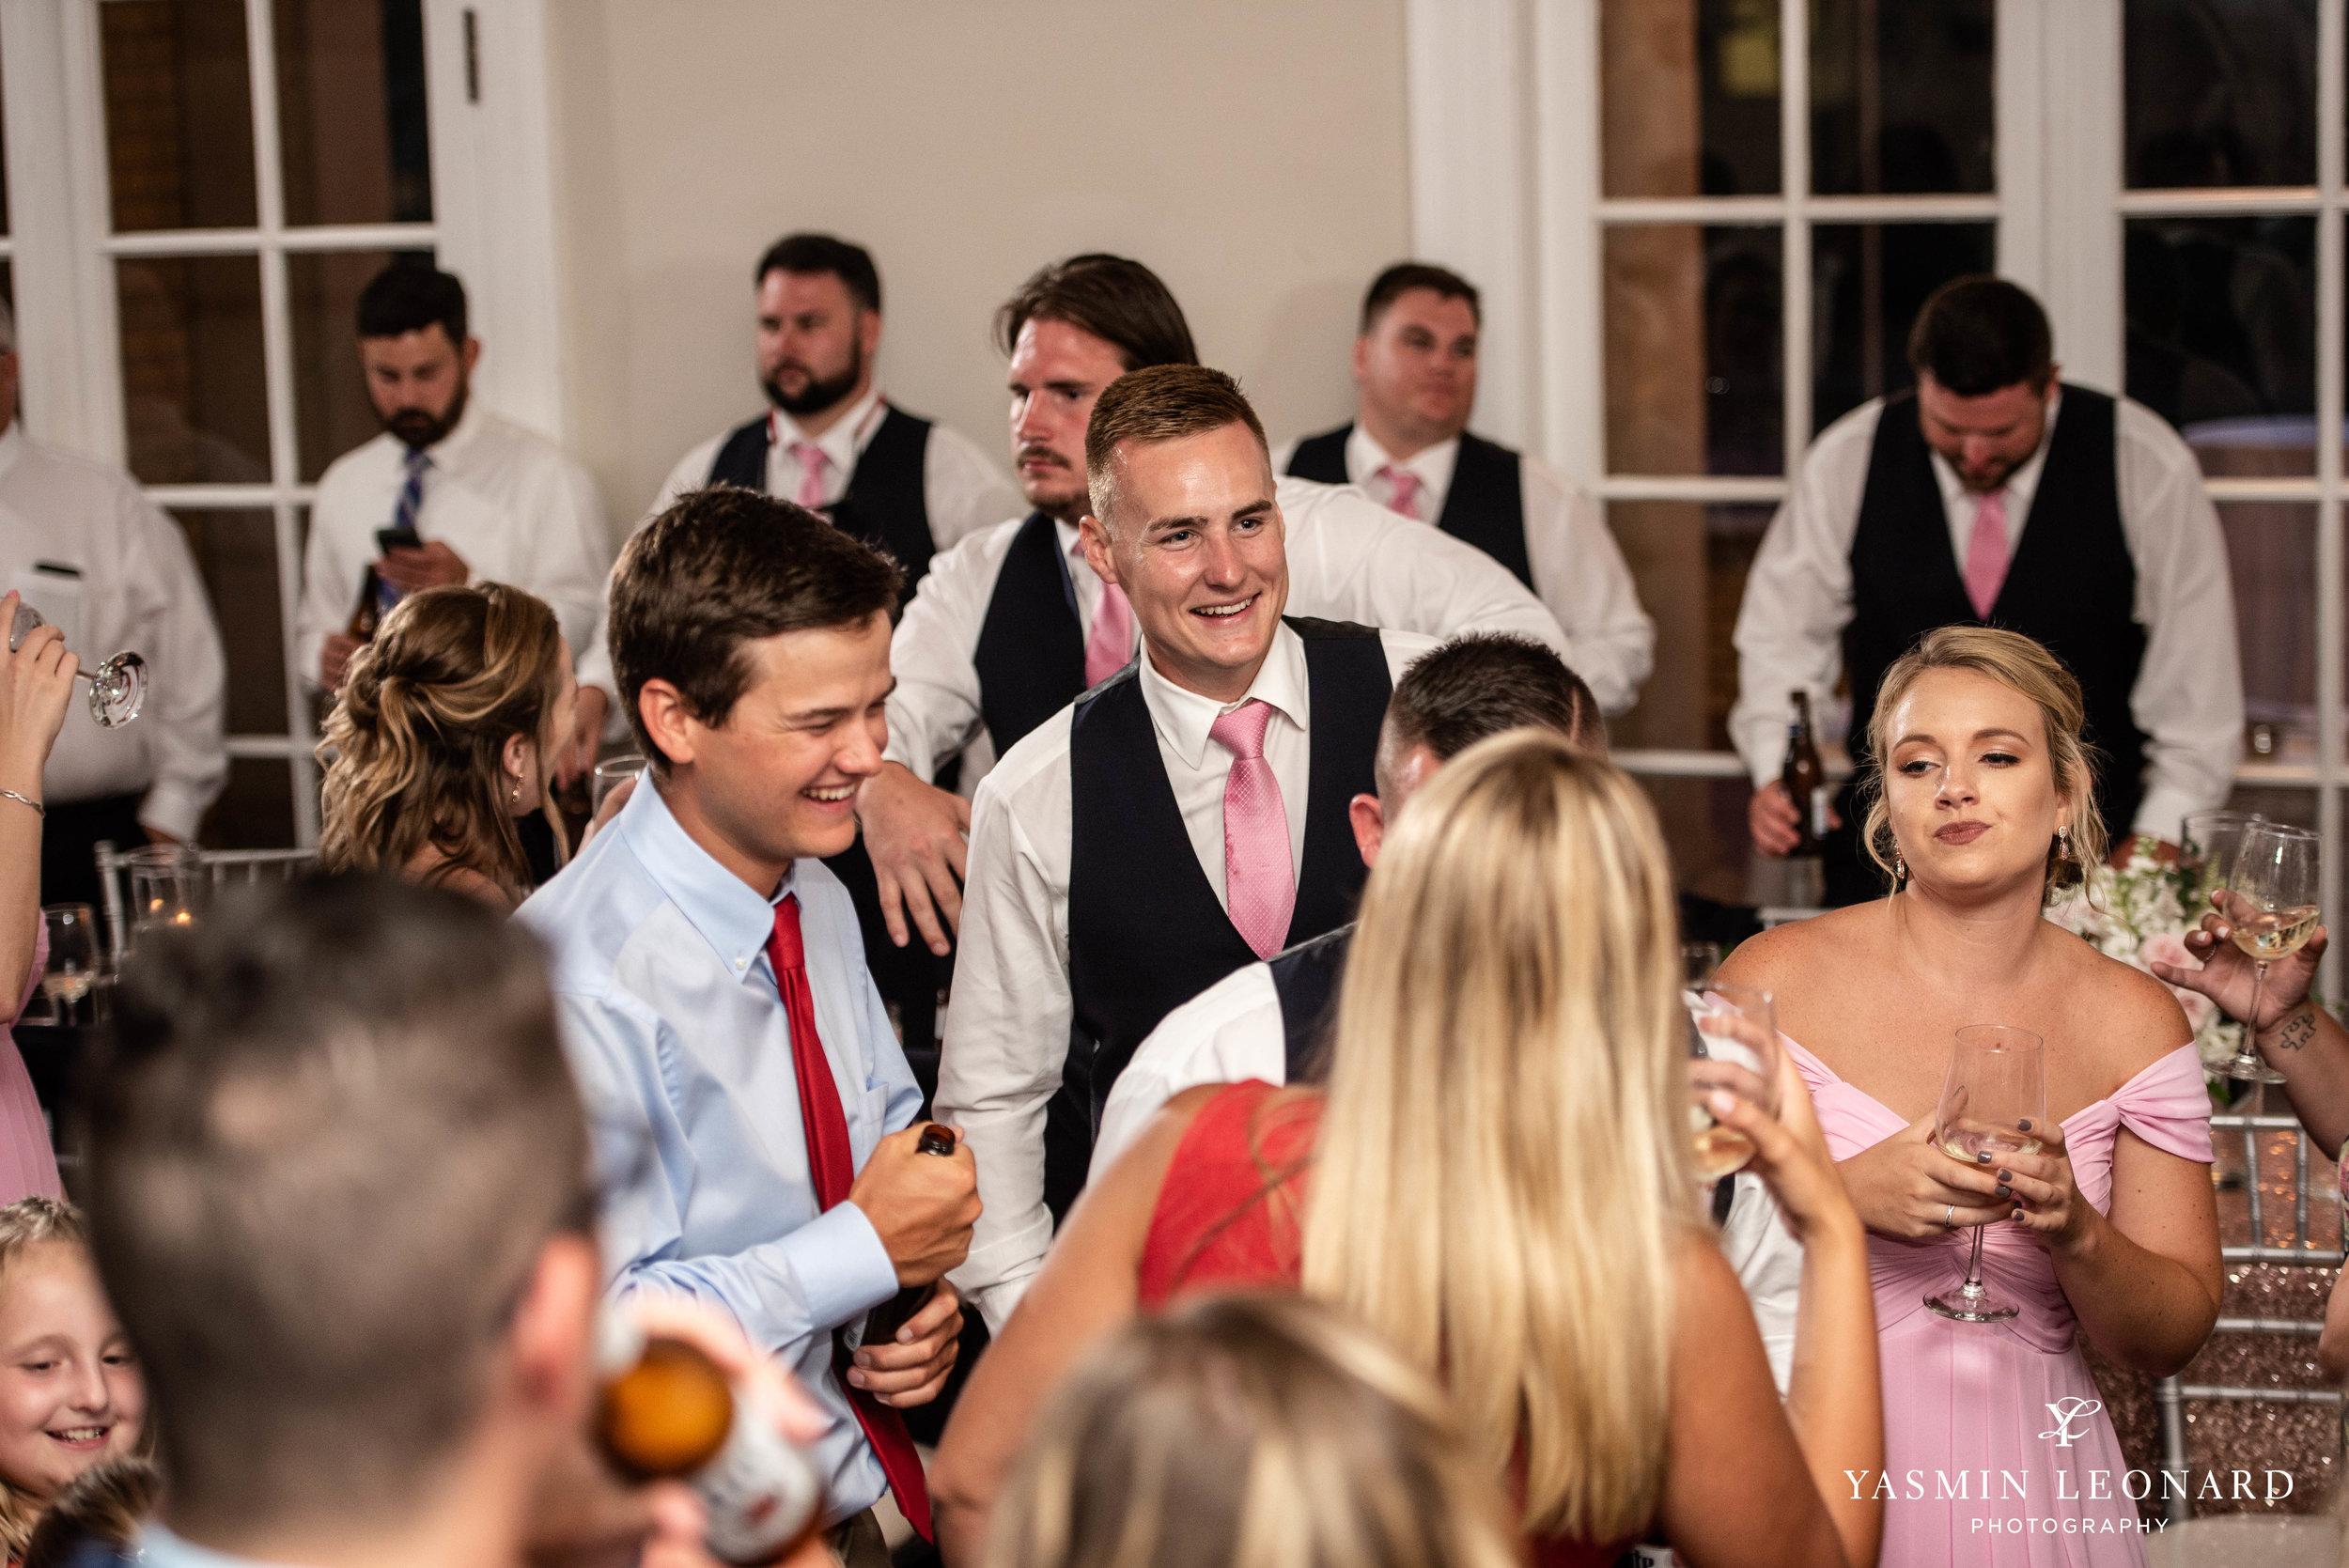 Separk Mansion - NC Weddings - Gastonia Wedding - NC Wedding Venues - Pink and Blue Wedding Ideas - Pink Bridesmaid Dresses - Yasmin Leonard Photography-61.jpg